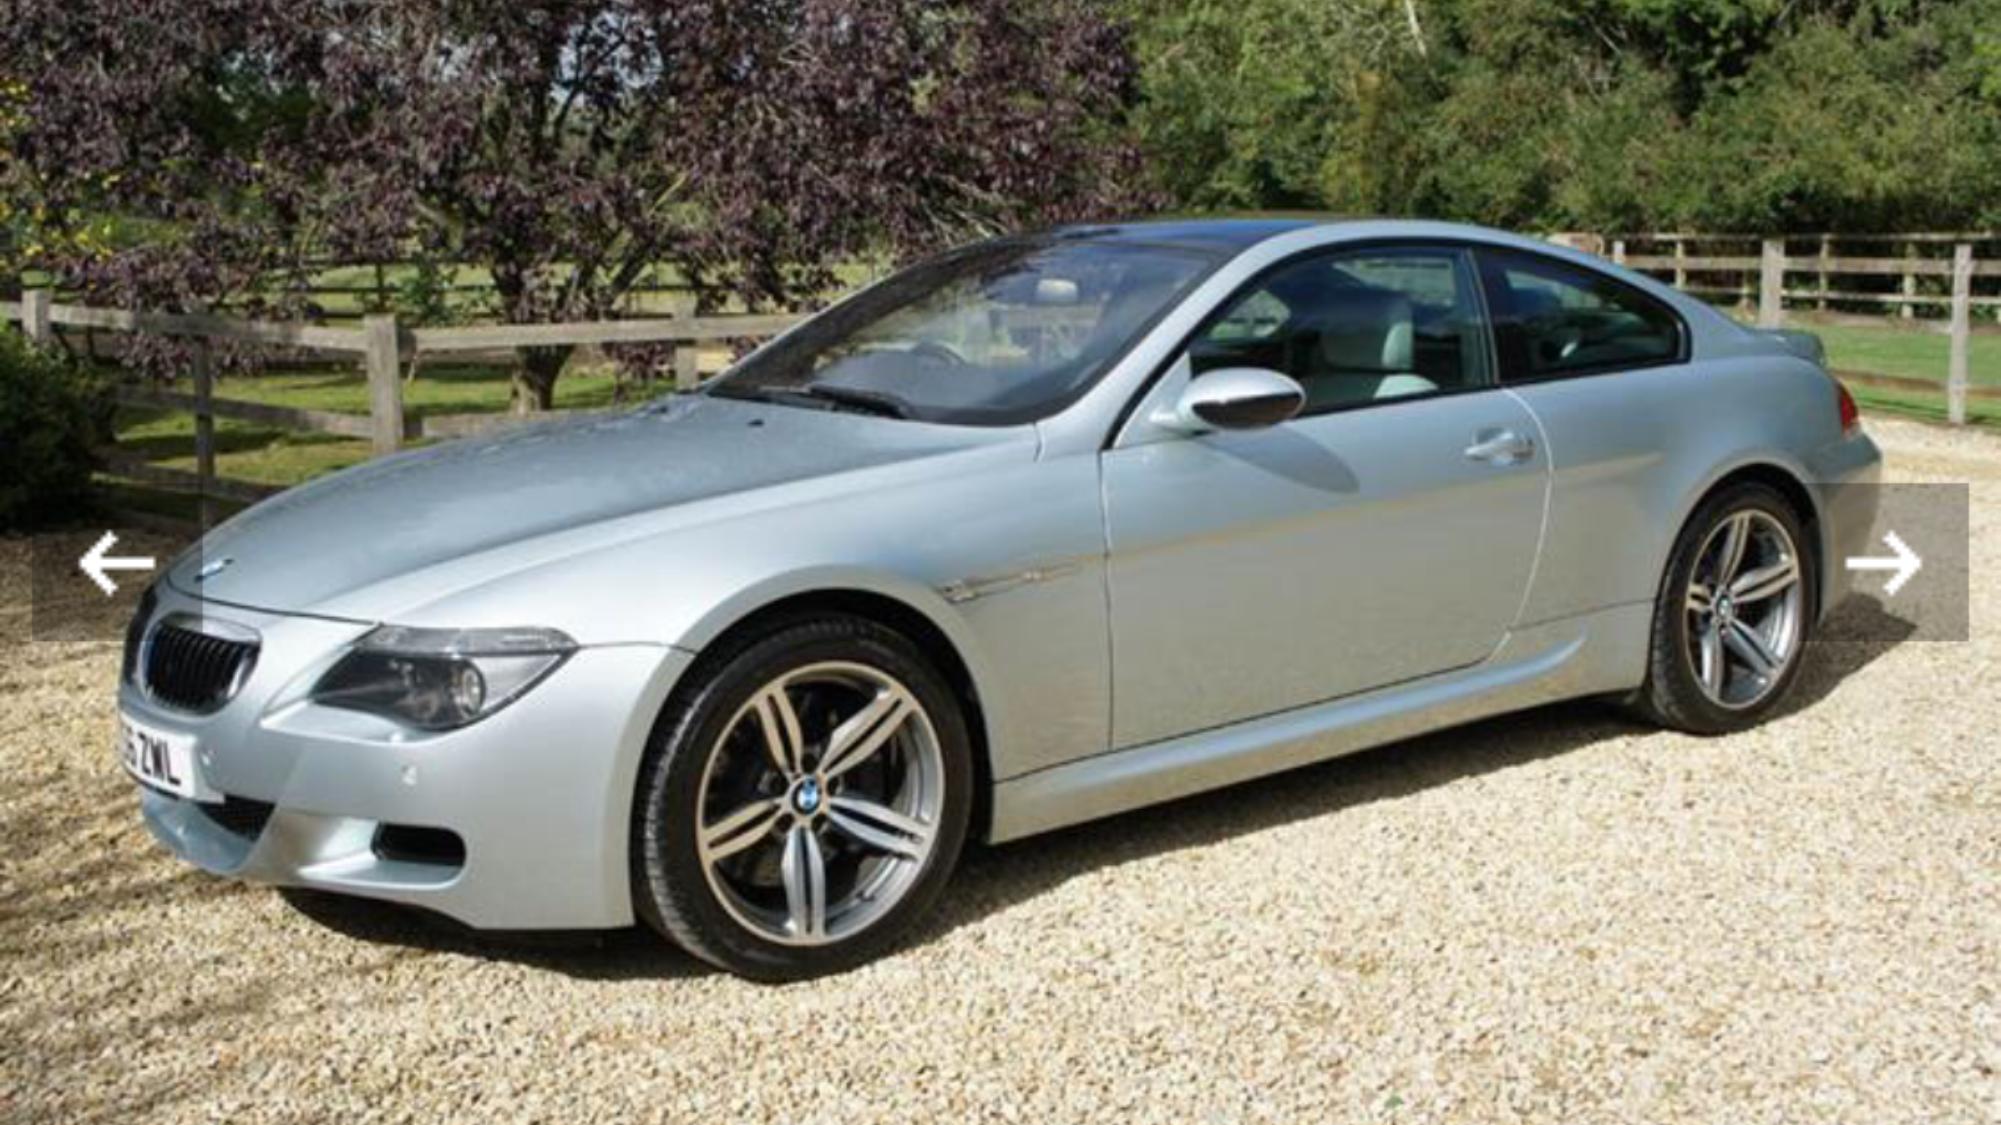 2007 BMW M6 V10 5.0 LOW MILEAGE - HUGE SPEC SOLD (picture 1 of 6)